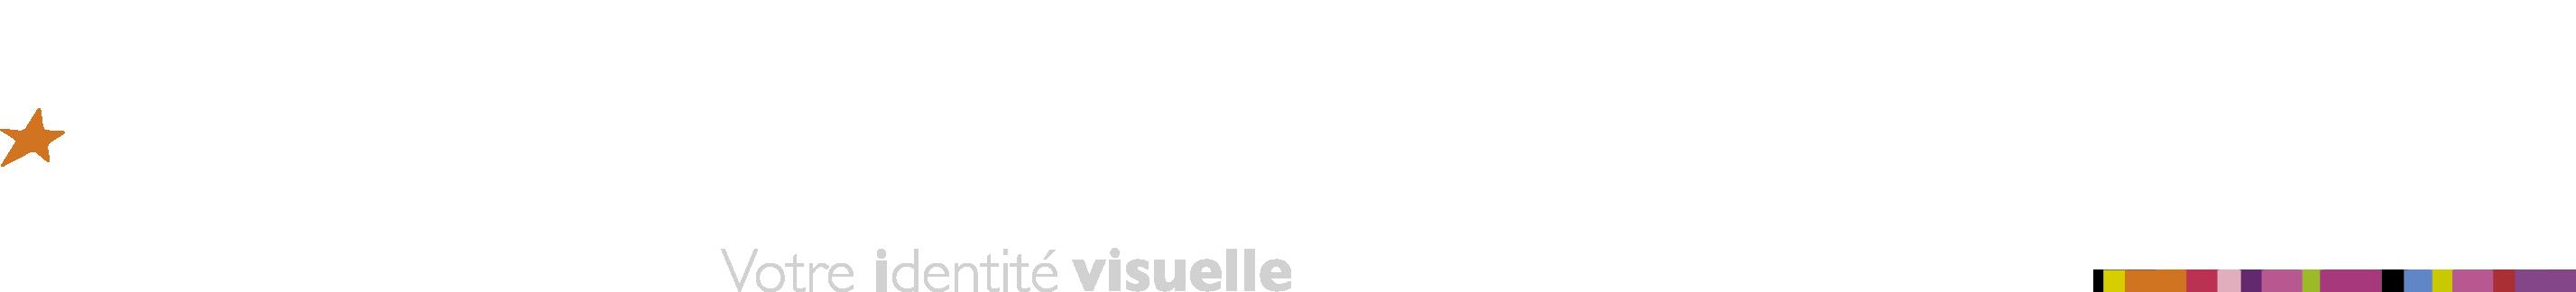 Agence de communication iStudio - Cholet